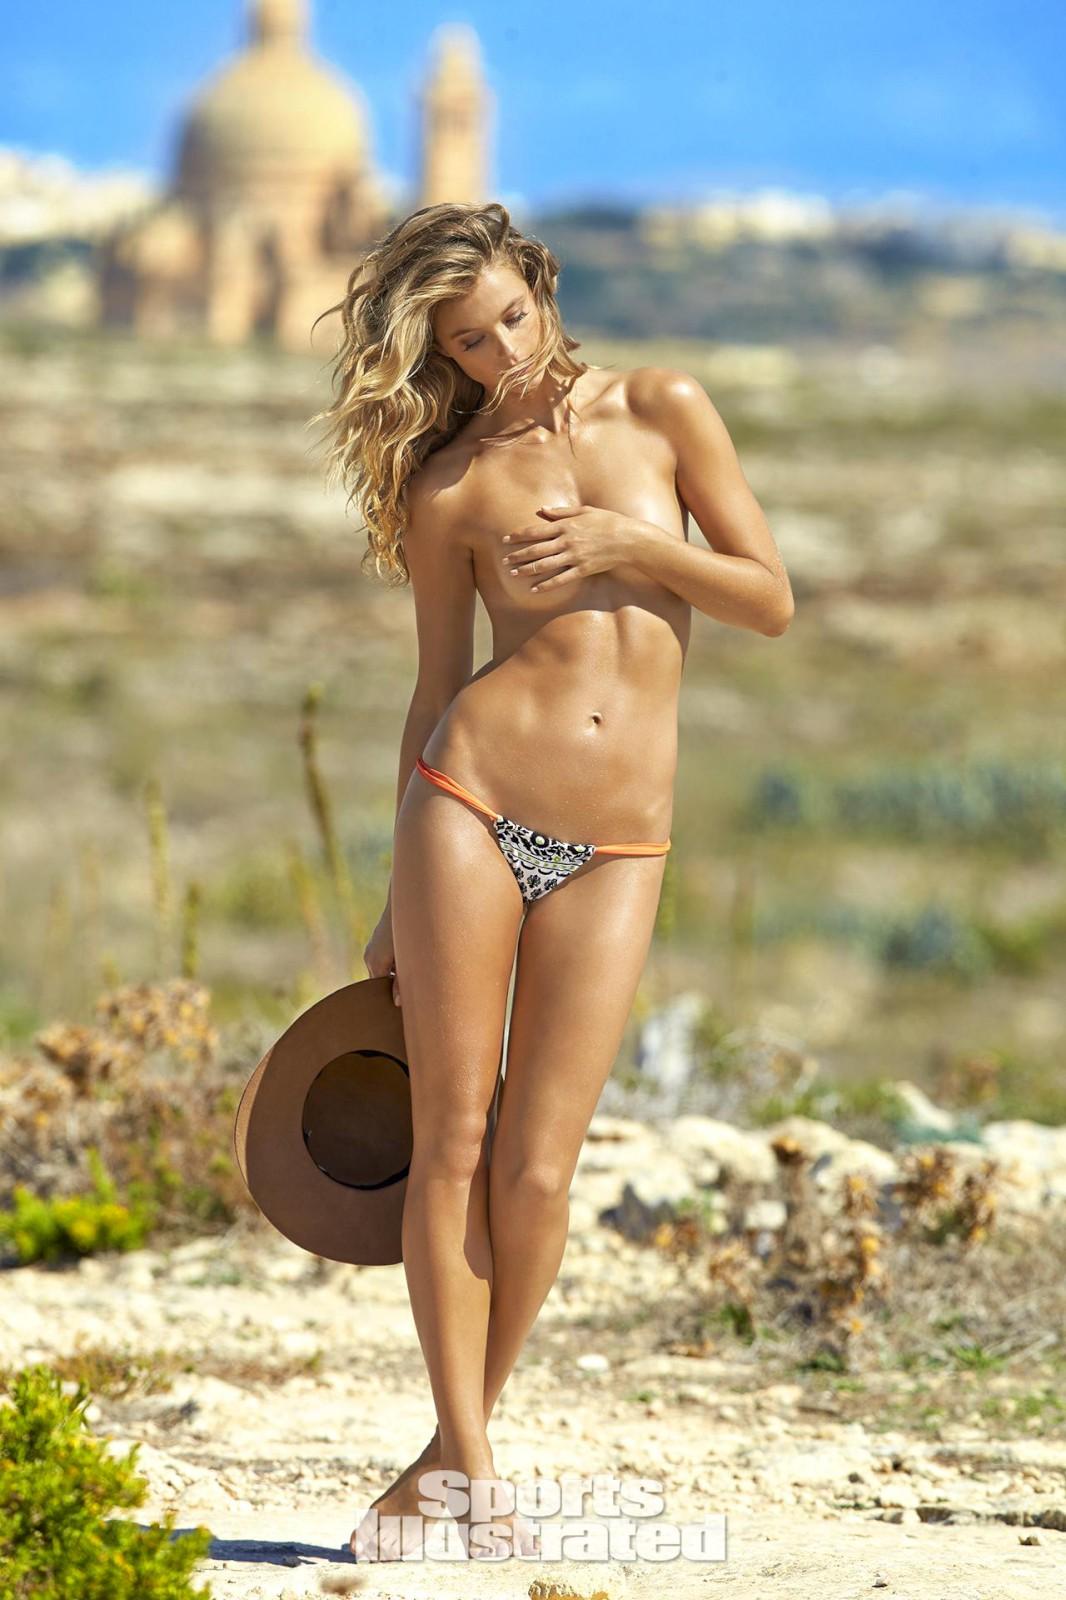 February 15, 2016 1066 × 1600 Kate Bock – Sports Illustrated ...